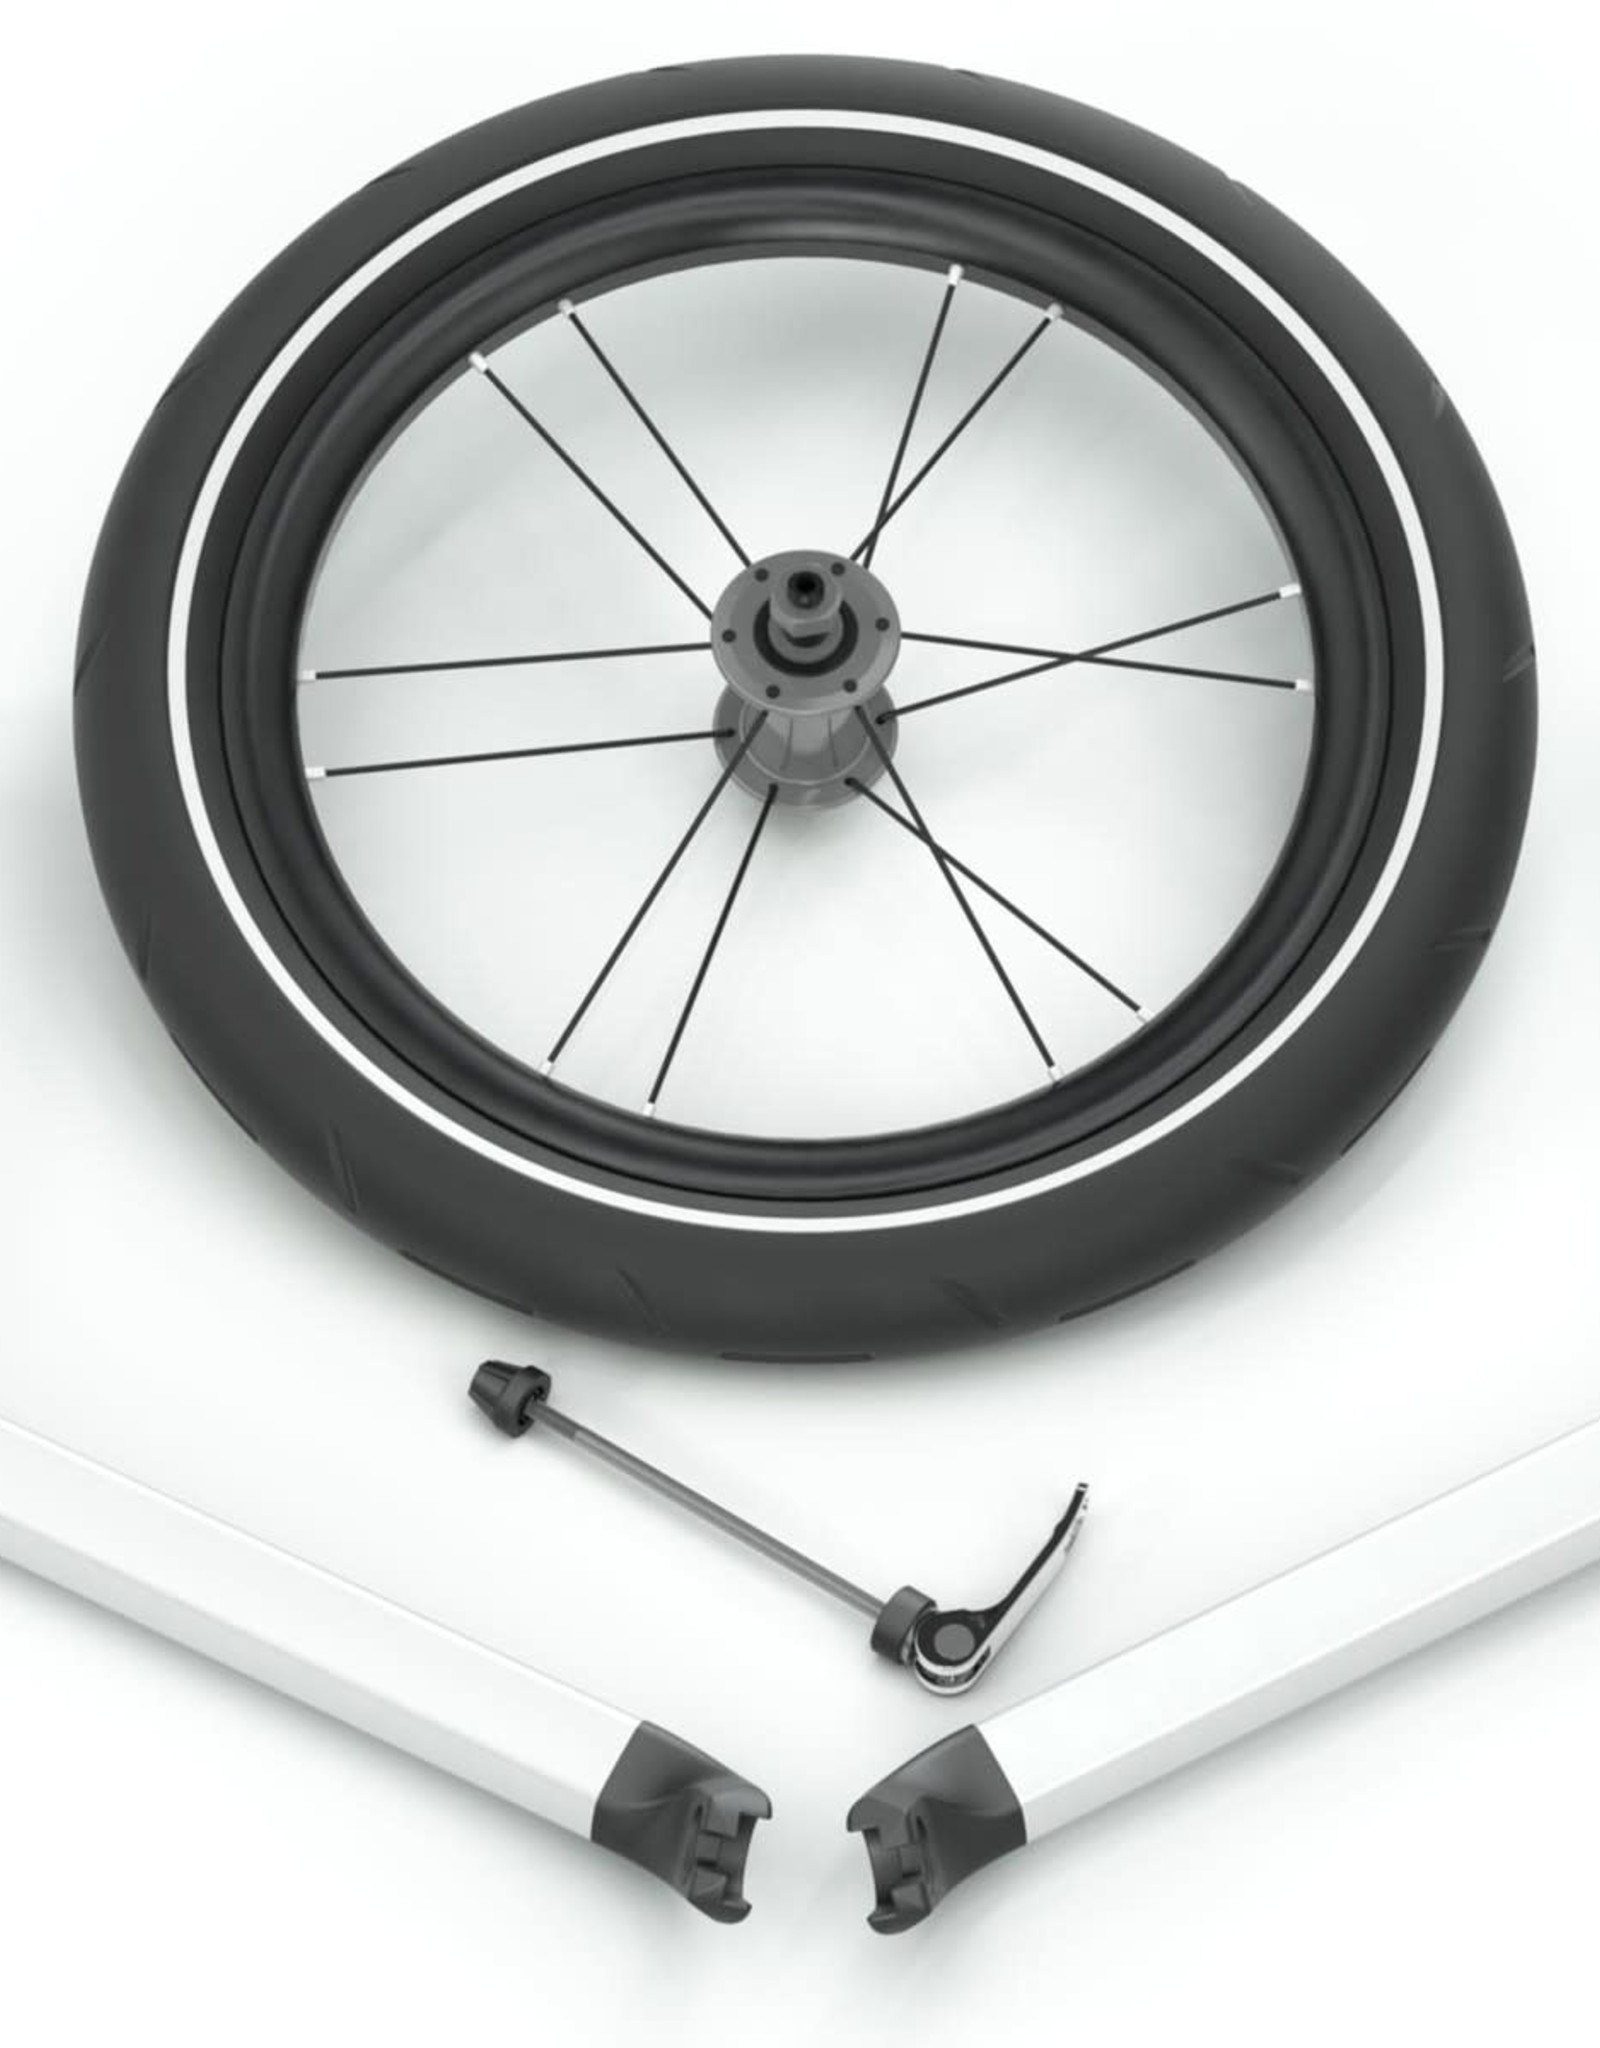 THULE THULE Chariot Jog Kit 2 - Lite/Cross BLACK/SILVER